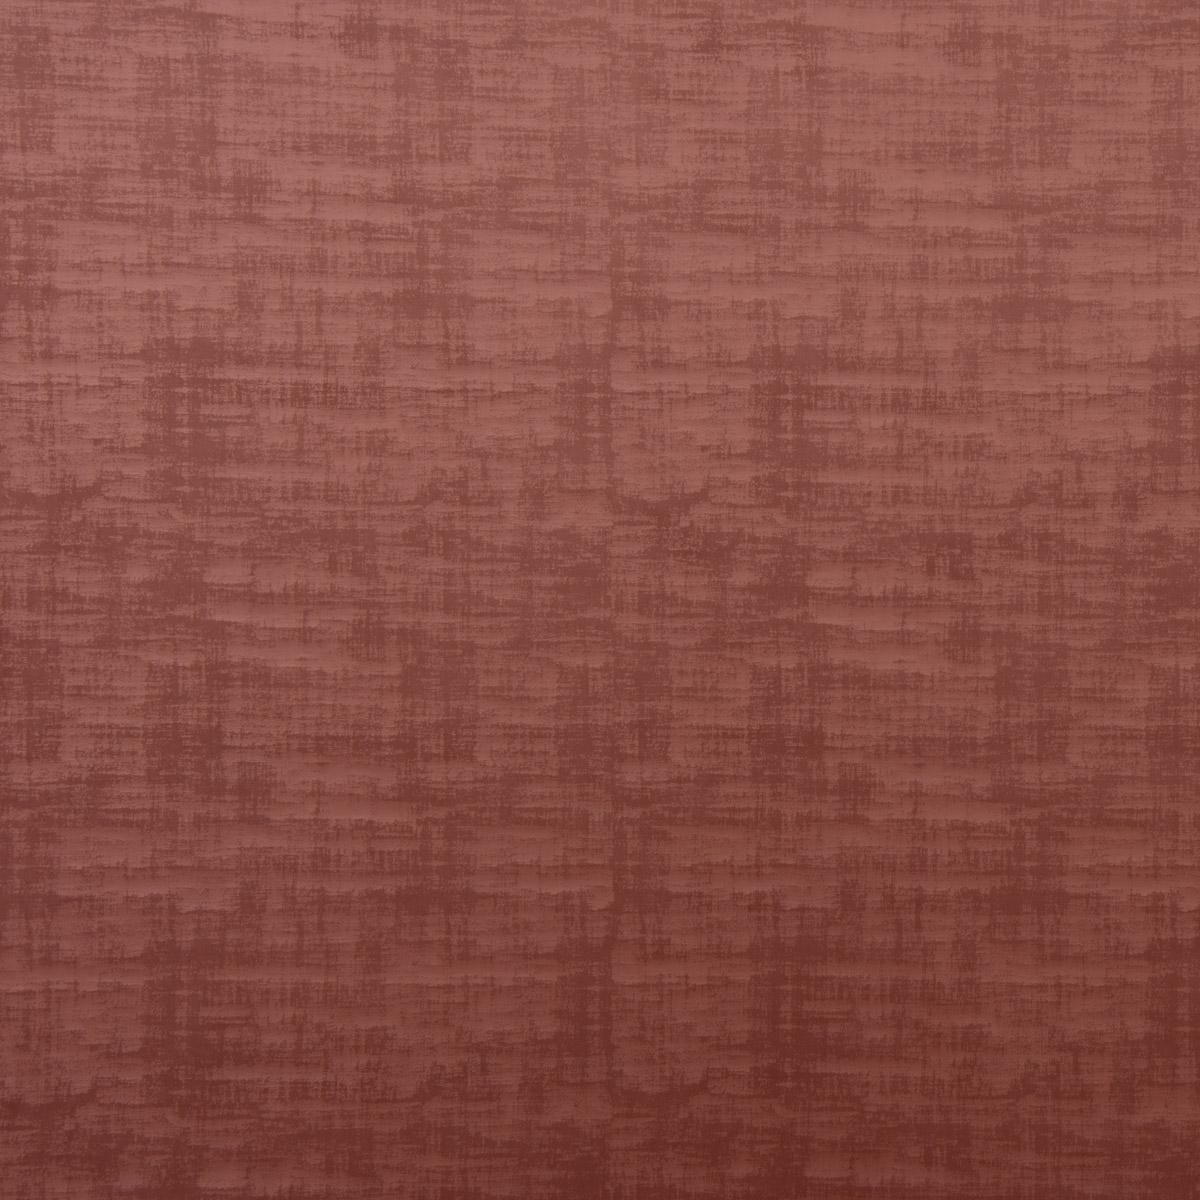 Samtstoff Dekostoff Velvet Marble Samt mit Struktur uni altrosa 1,40m Breite